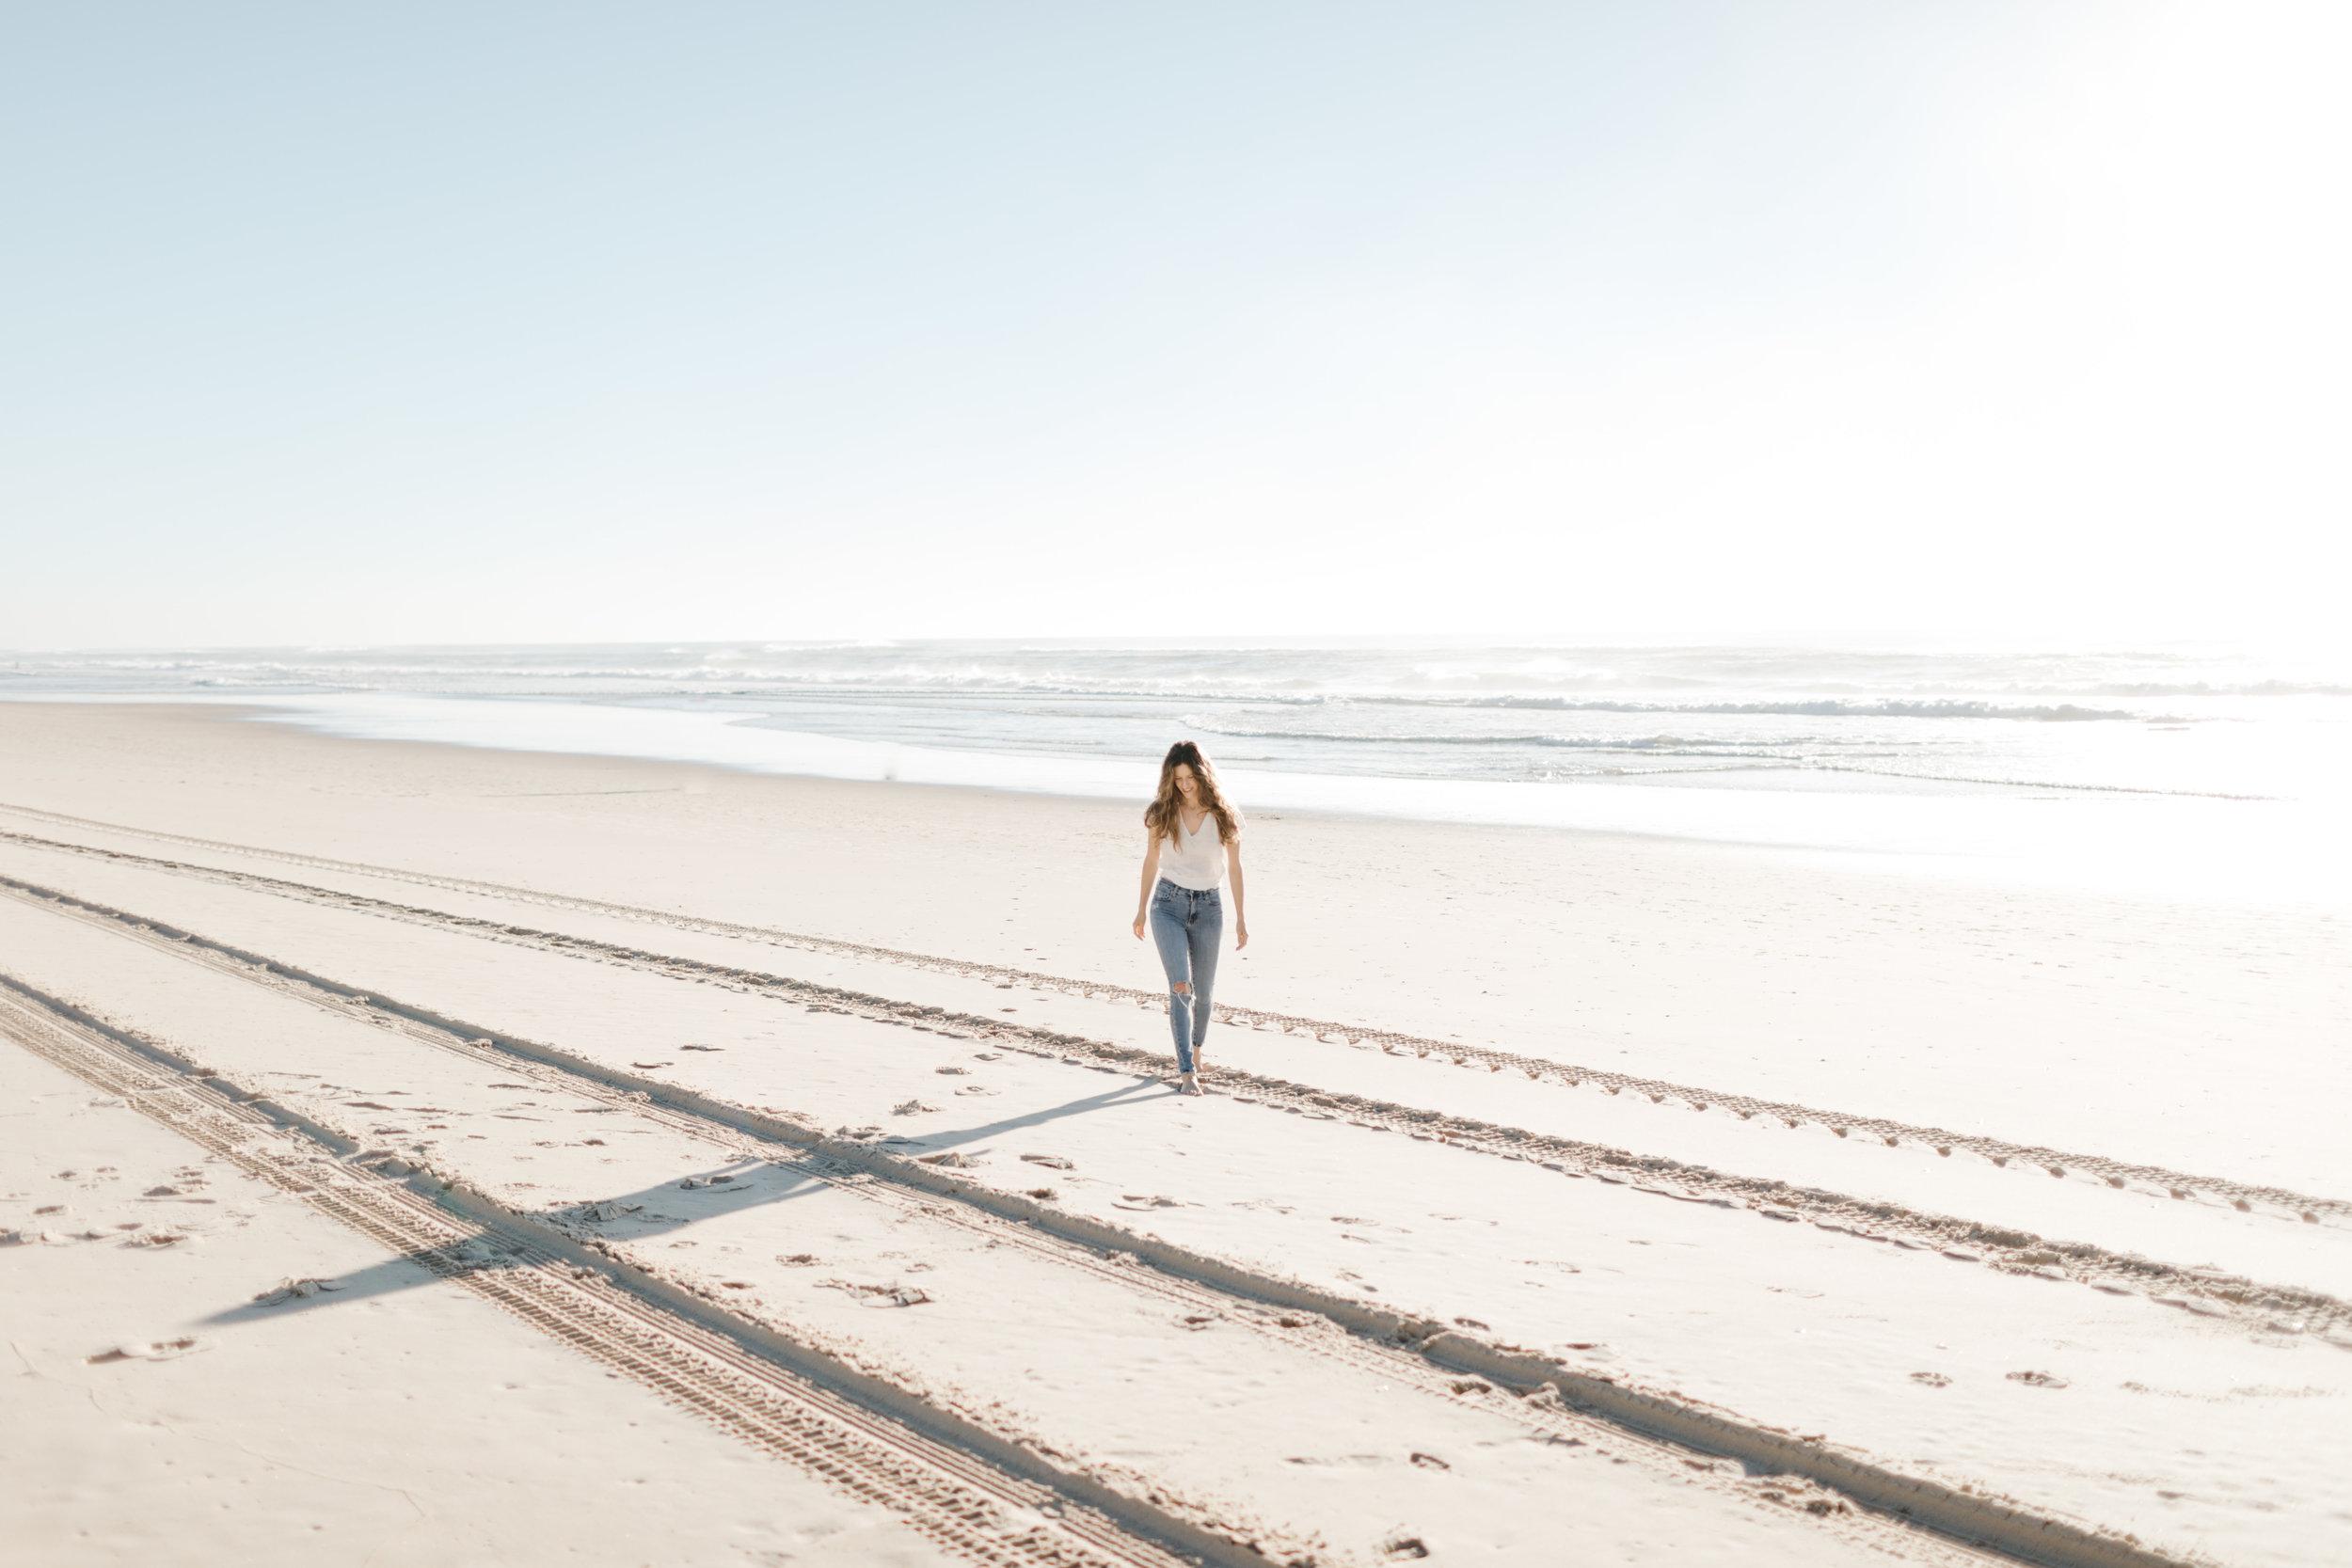 brisbane_mermaid_beach_gold_coast_photo_by_samantha_look.jpg